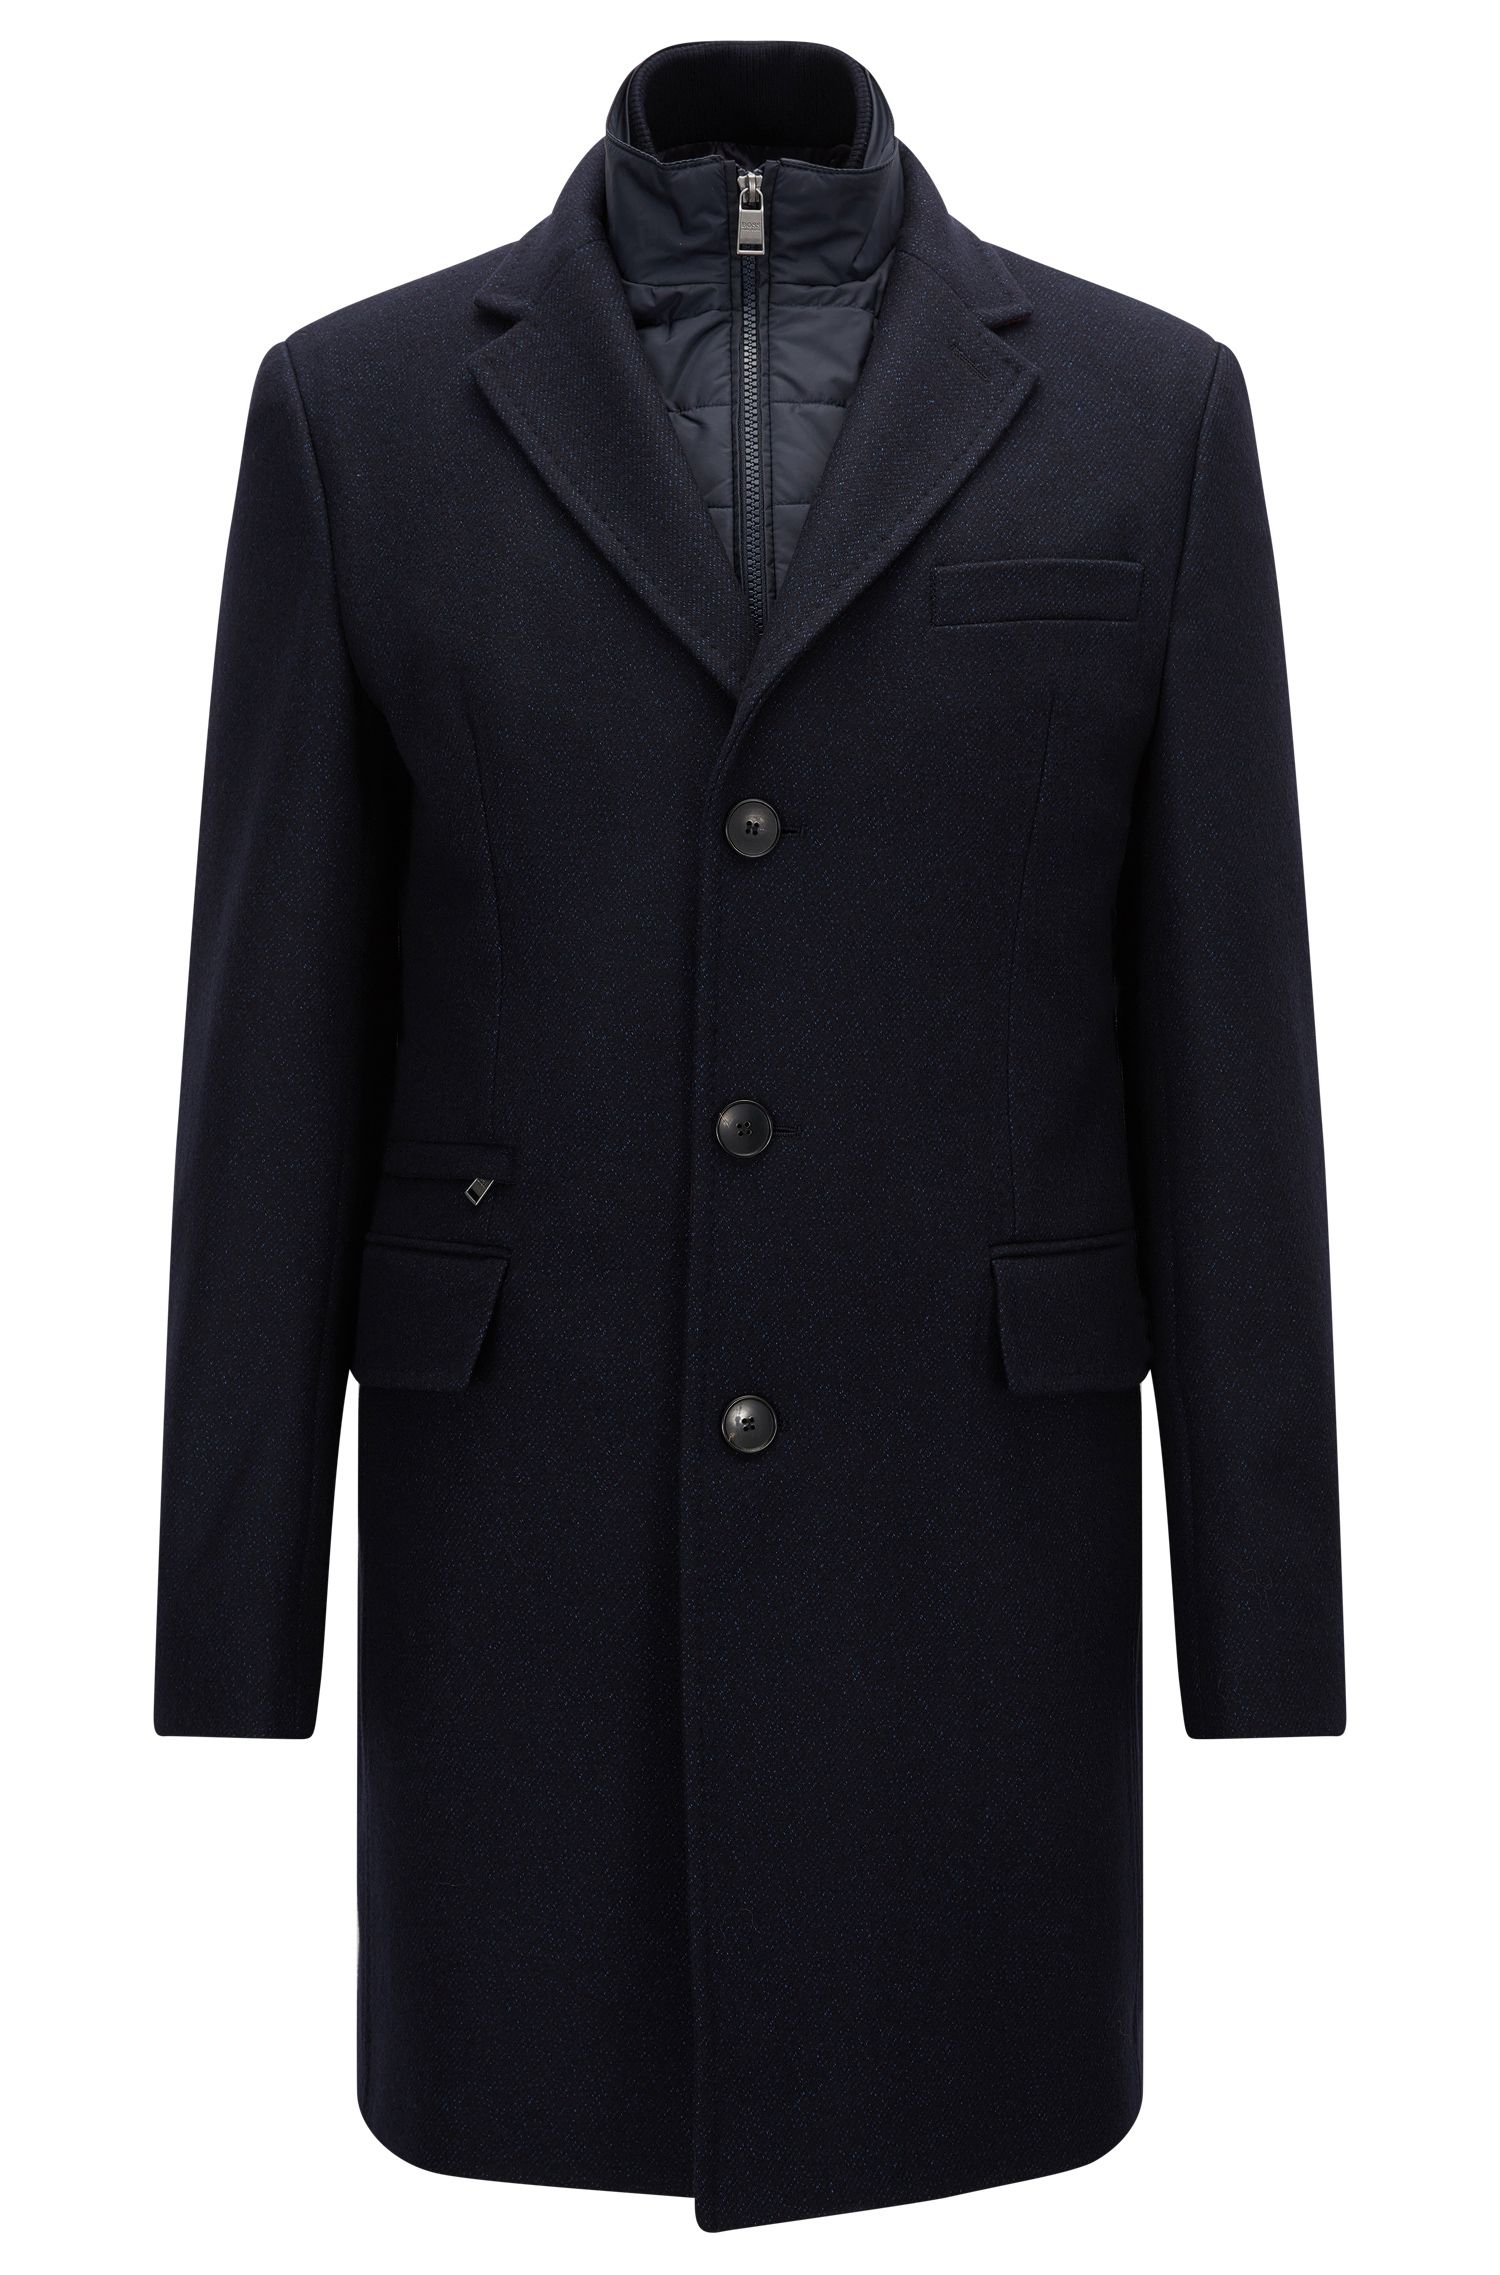 'Nadim' | Wool Blend Twill Topcoat